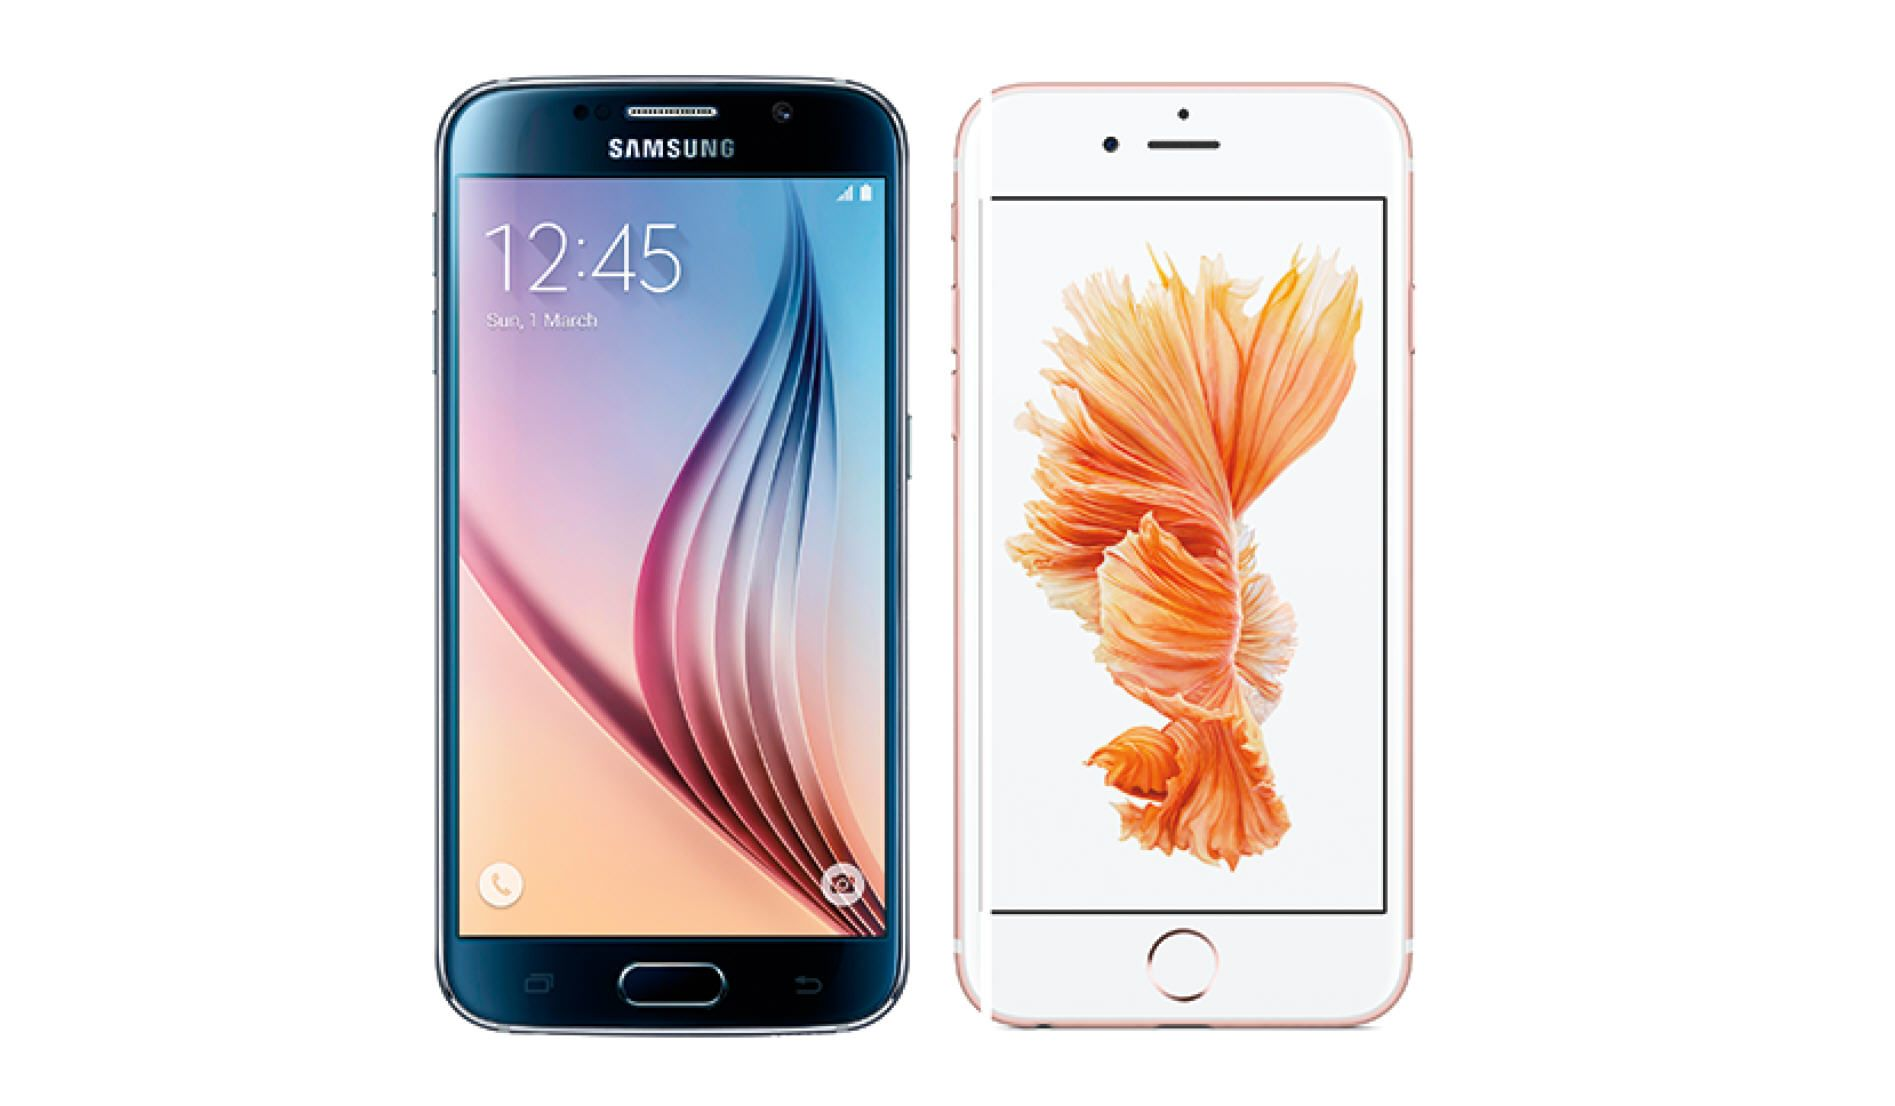 iPhone-6s-Samsung-Galaxy-S6